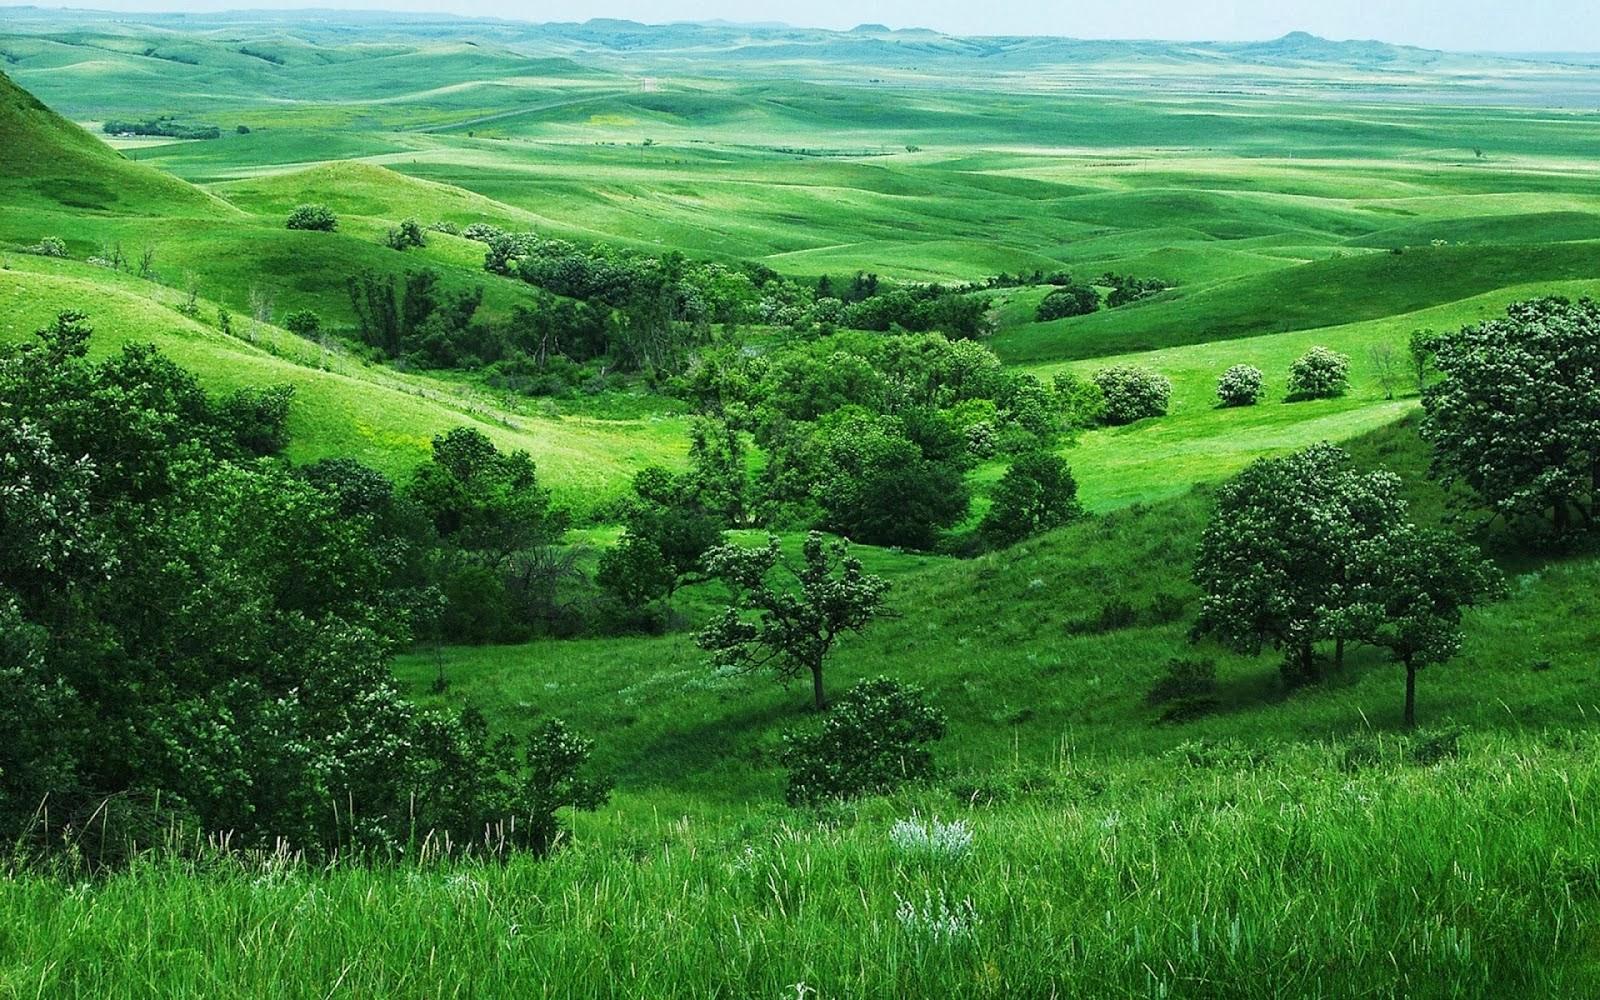 Most Beautiful Lush Green Full Hd Desktop Backgrounds - High Resolution Green Landscape , HD Wallpaper & Backgrounds